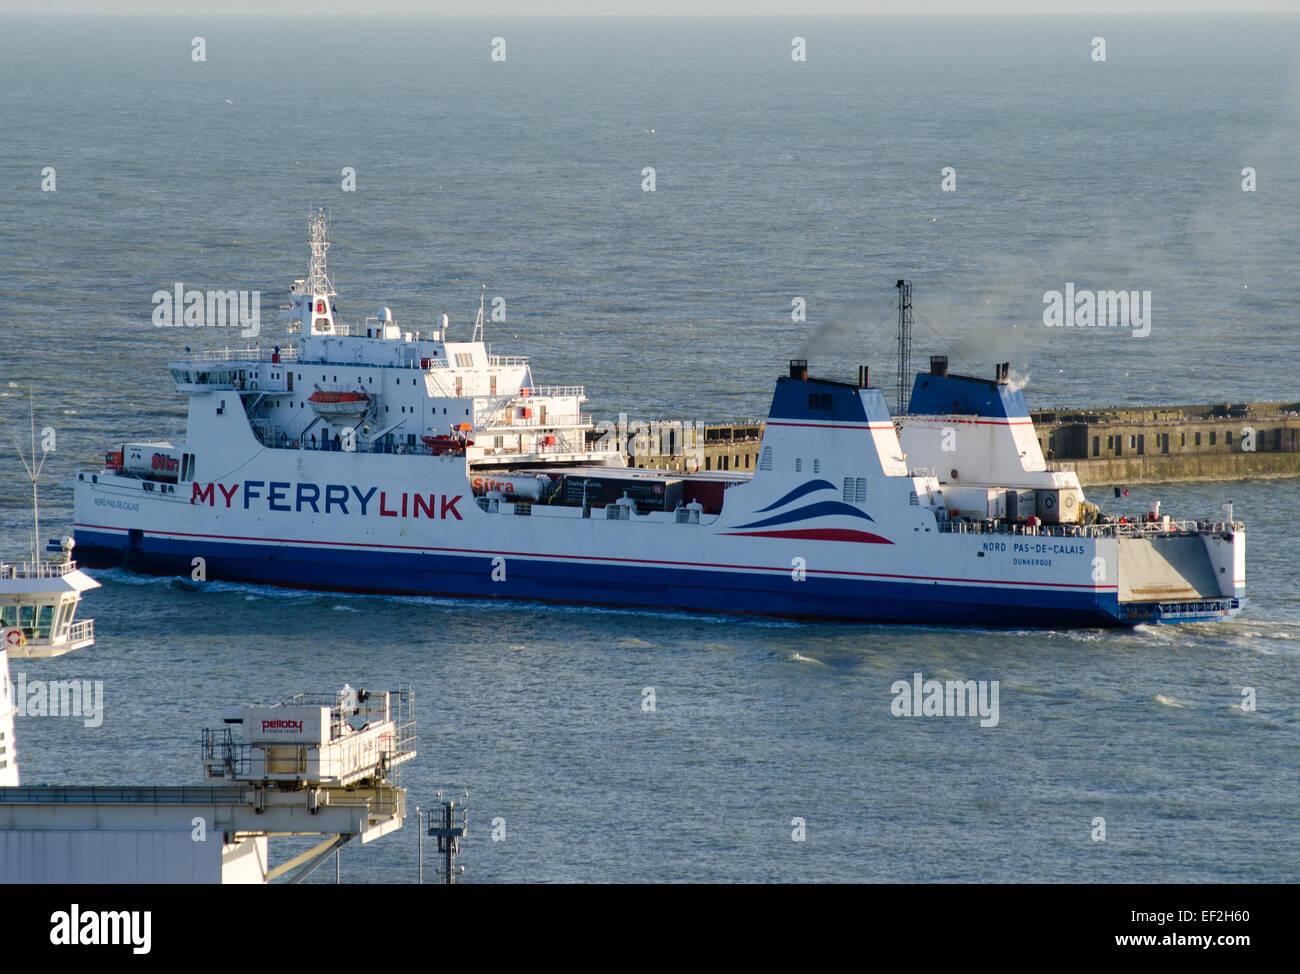 My Ferry Link ship MS Nord Pas de Calais leaving the Port of Dover, Kent, UK. en route for Calais. - Stock Image